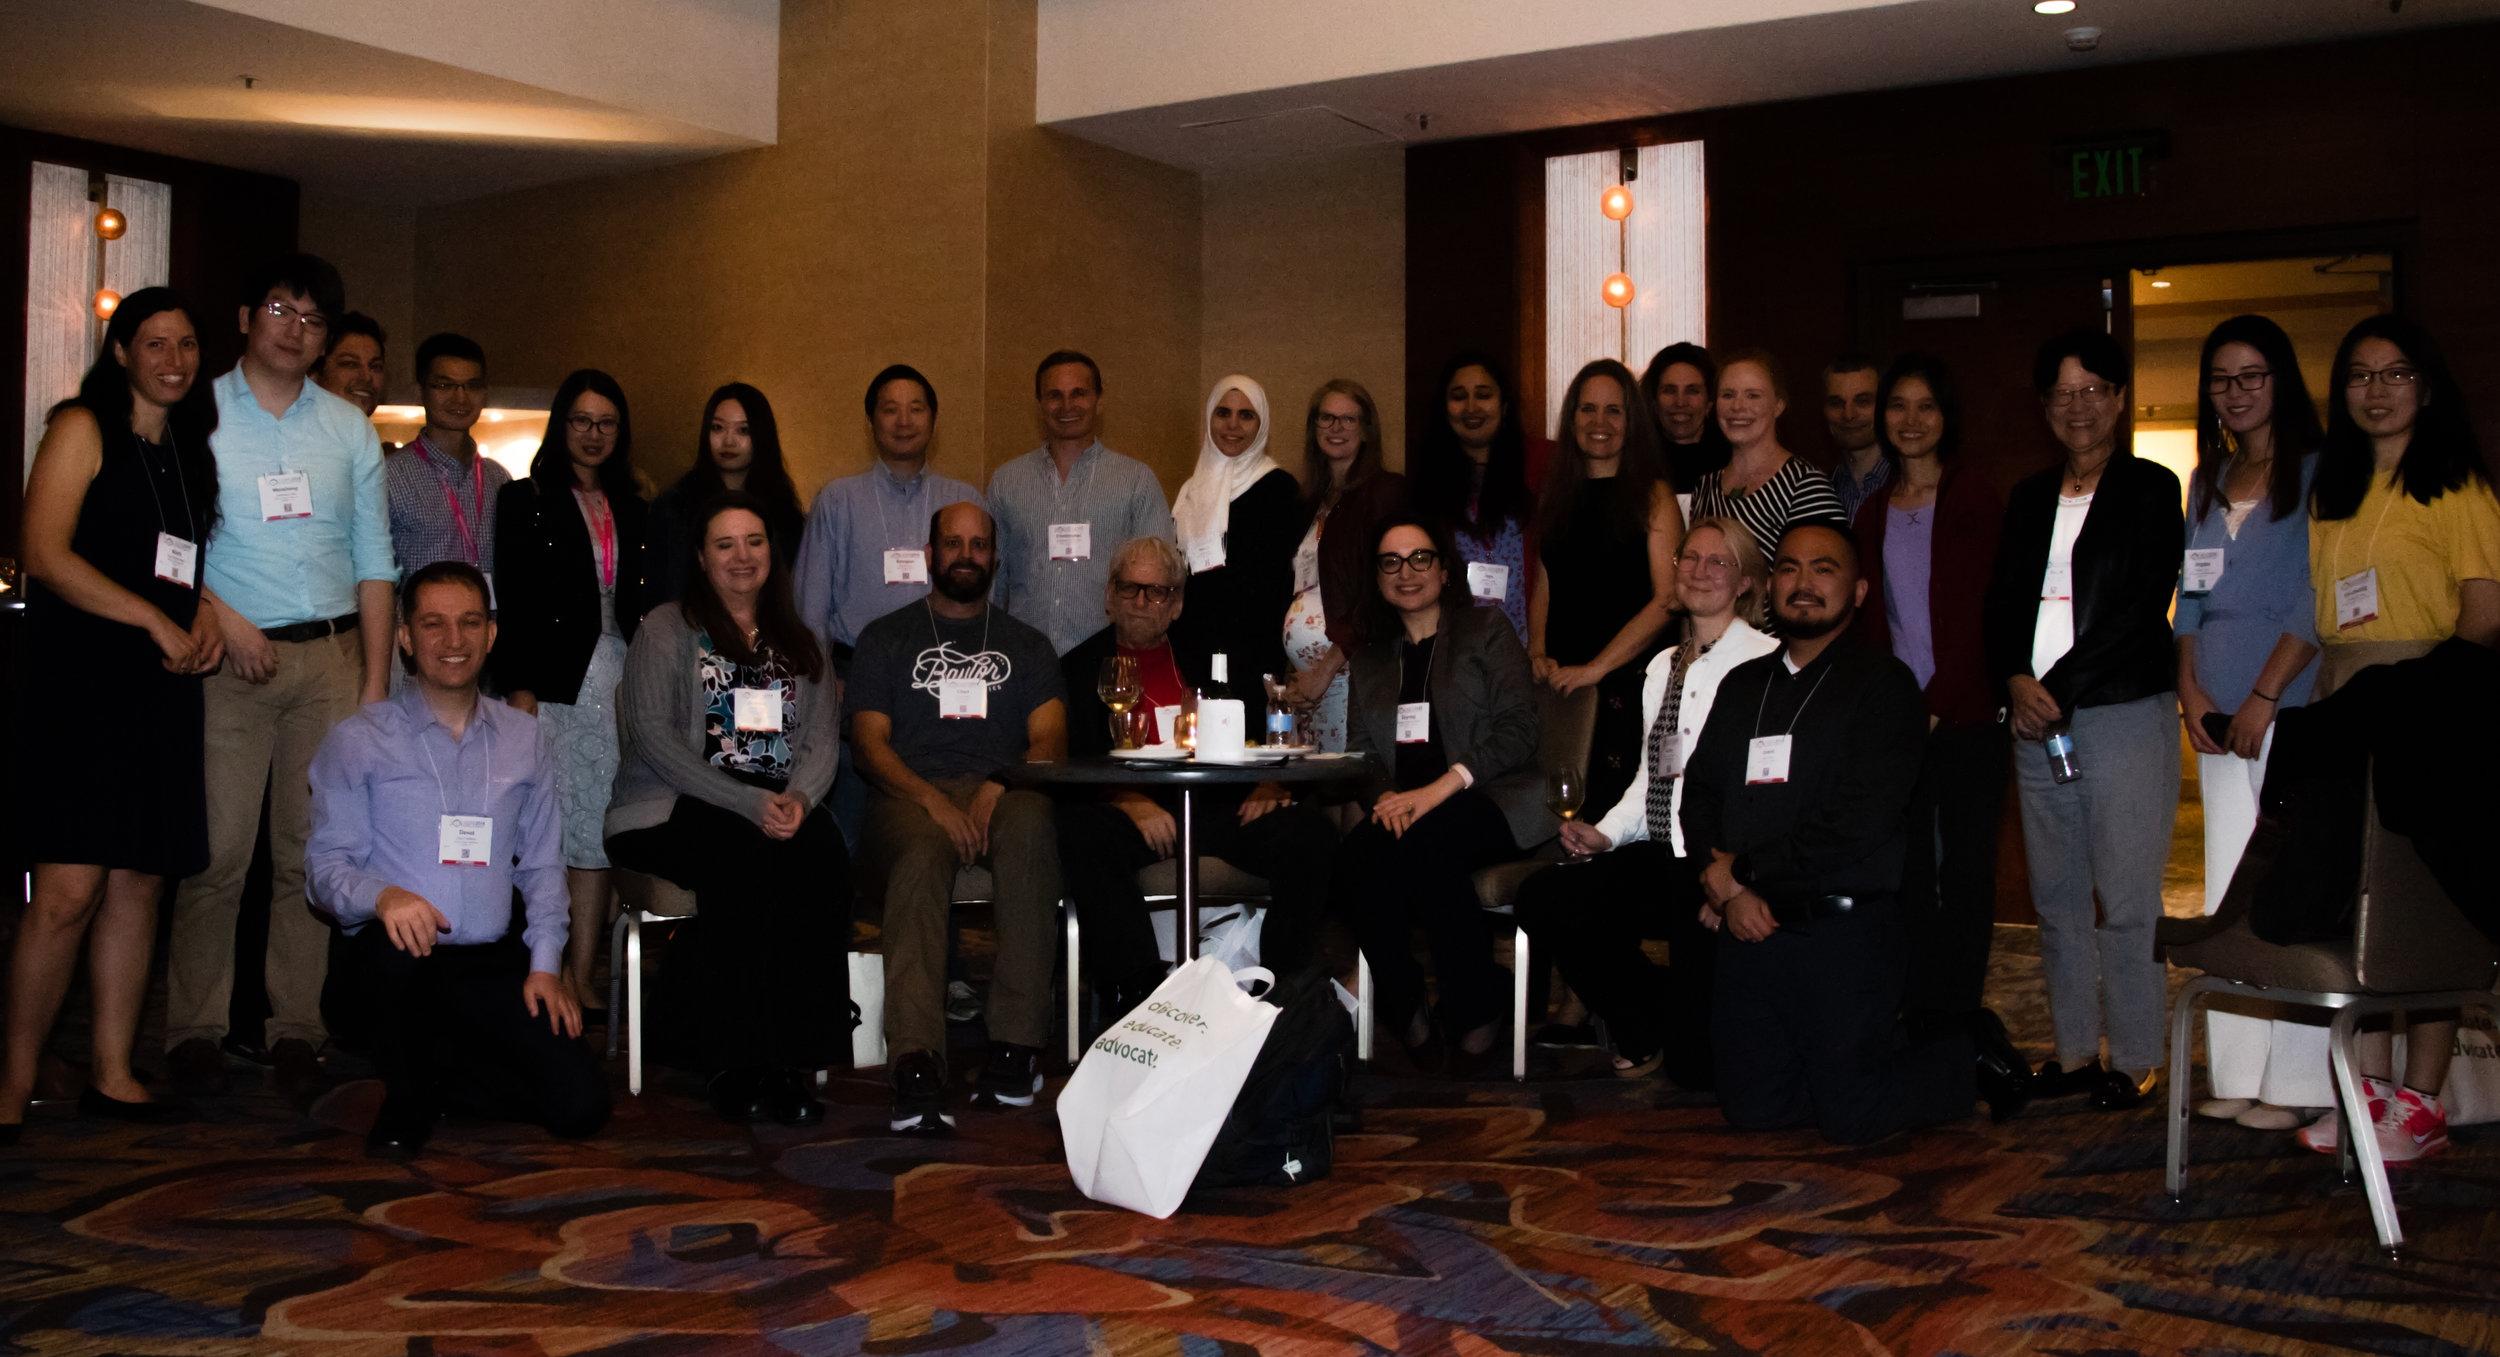 Annual ASHG Meetings - American Society of Human Genetics